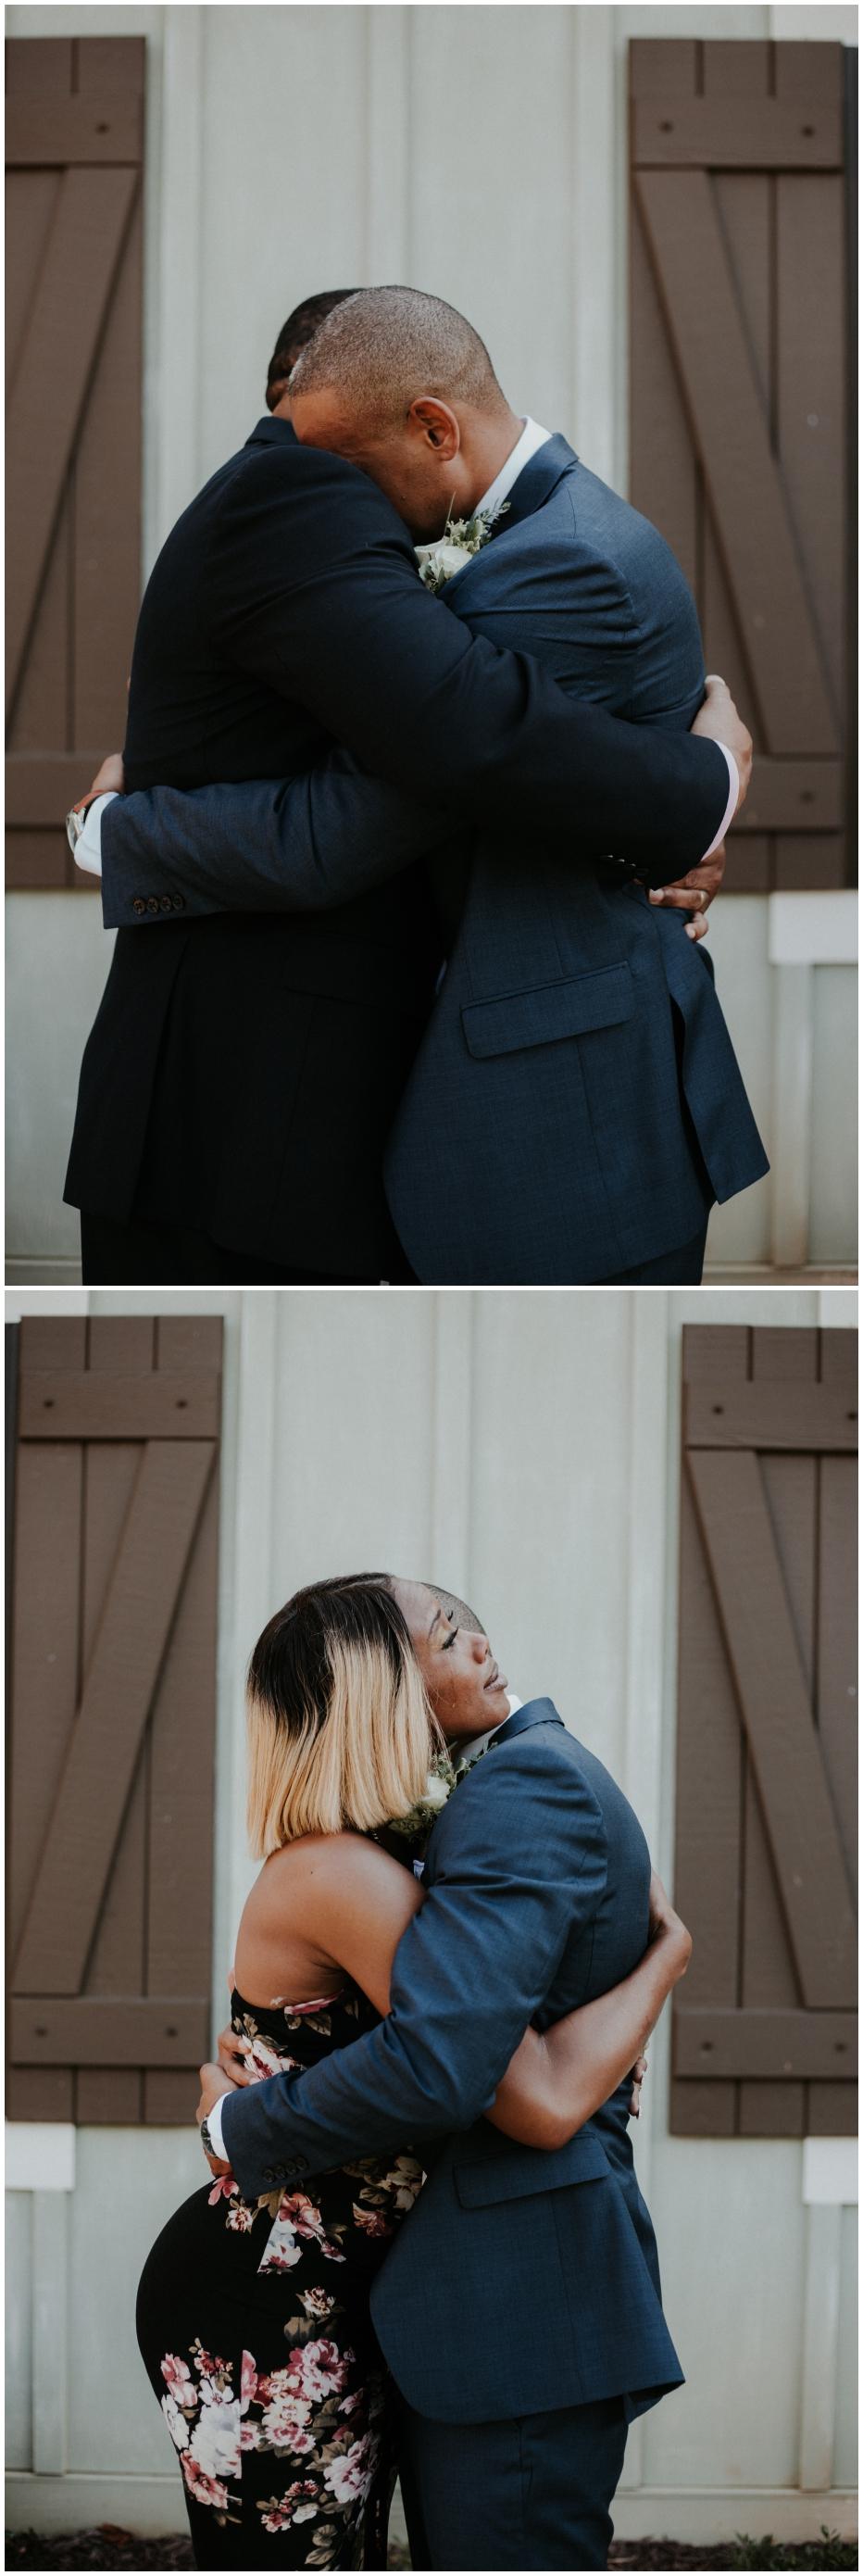 Posh-Moments-Photography-NC- Wedding-Photographer-Rolling-Hills-Farms-Wedding-Monroe-NC-Charlotte-NC_0261.jpg